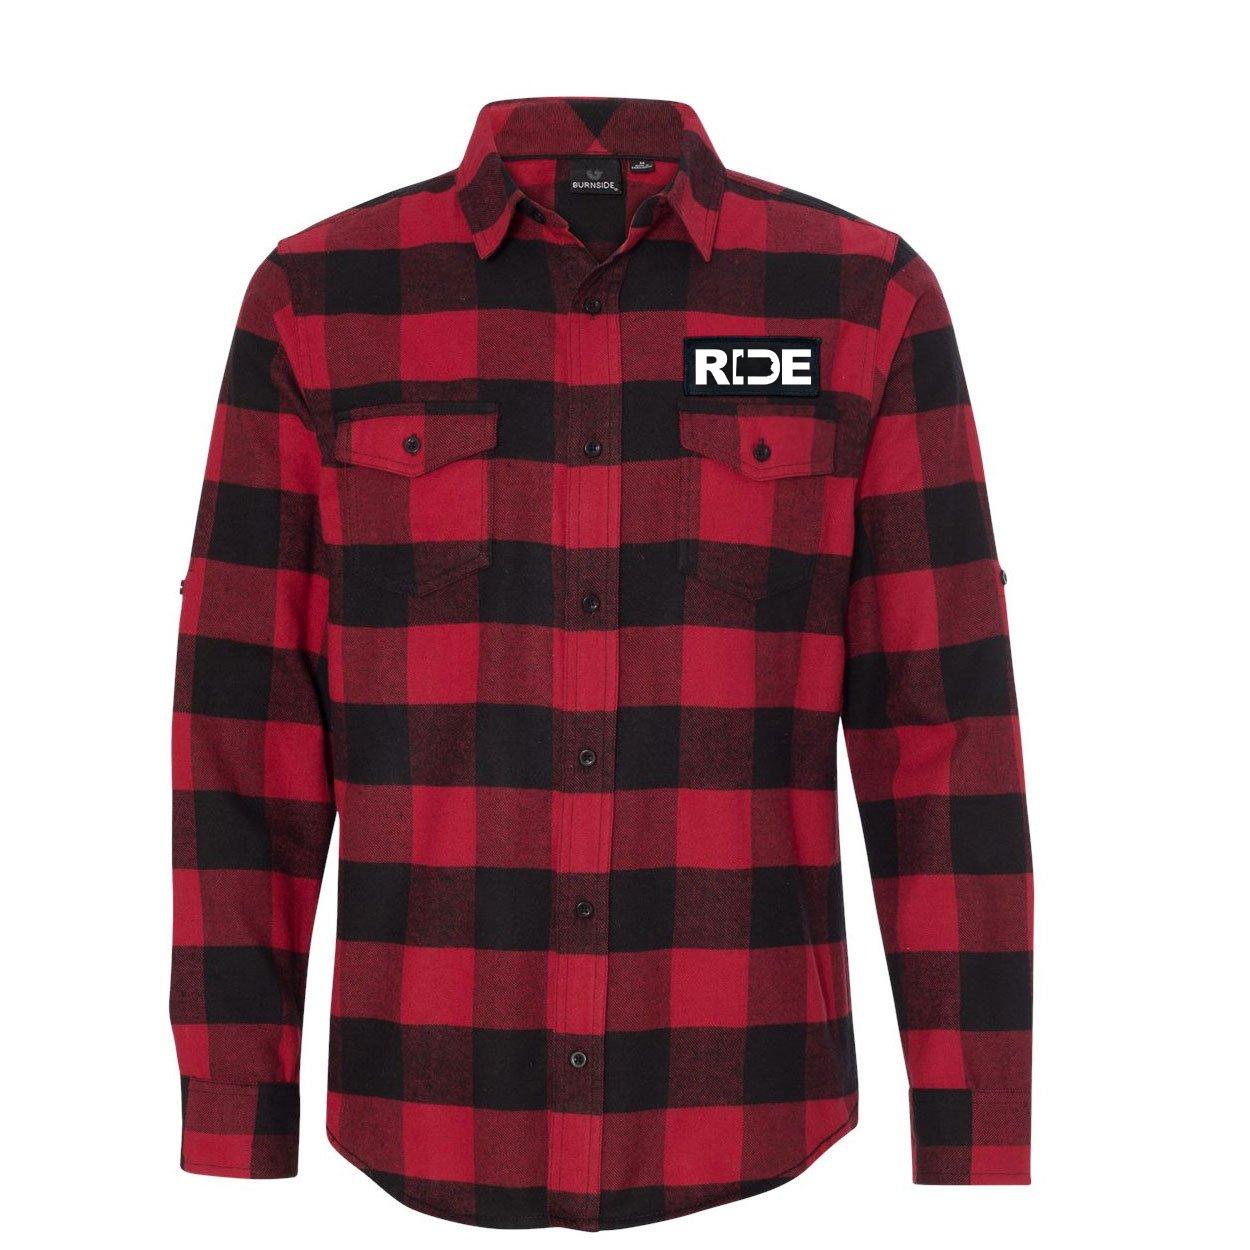 Ride Pennsylvania Classic Unisex Long Sleeve Woven Patch Flannel Shirt Red/Black Buffalo (White Logo)